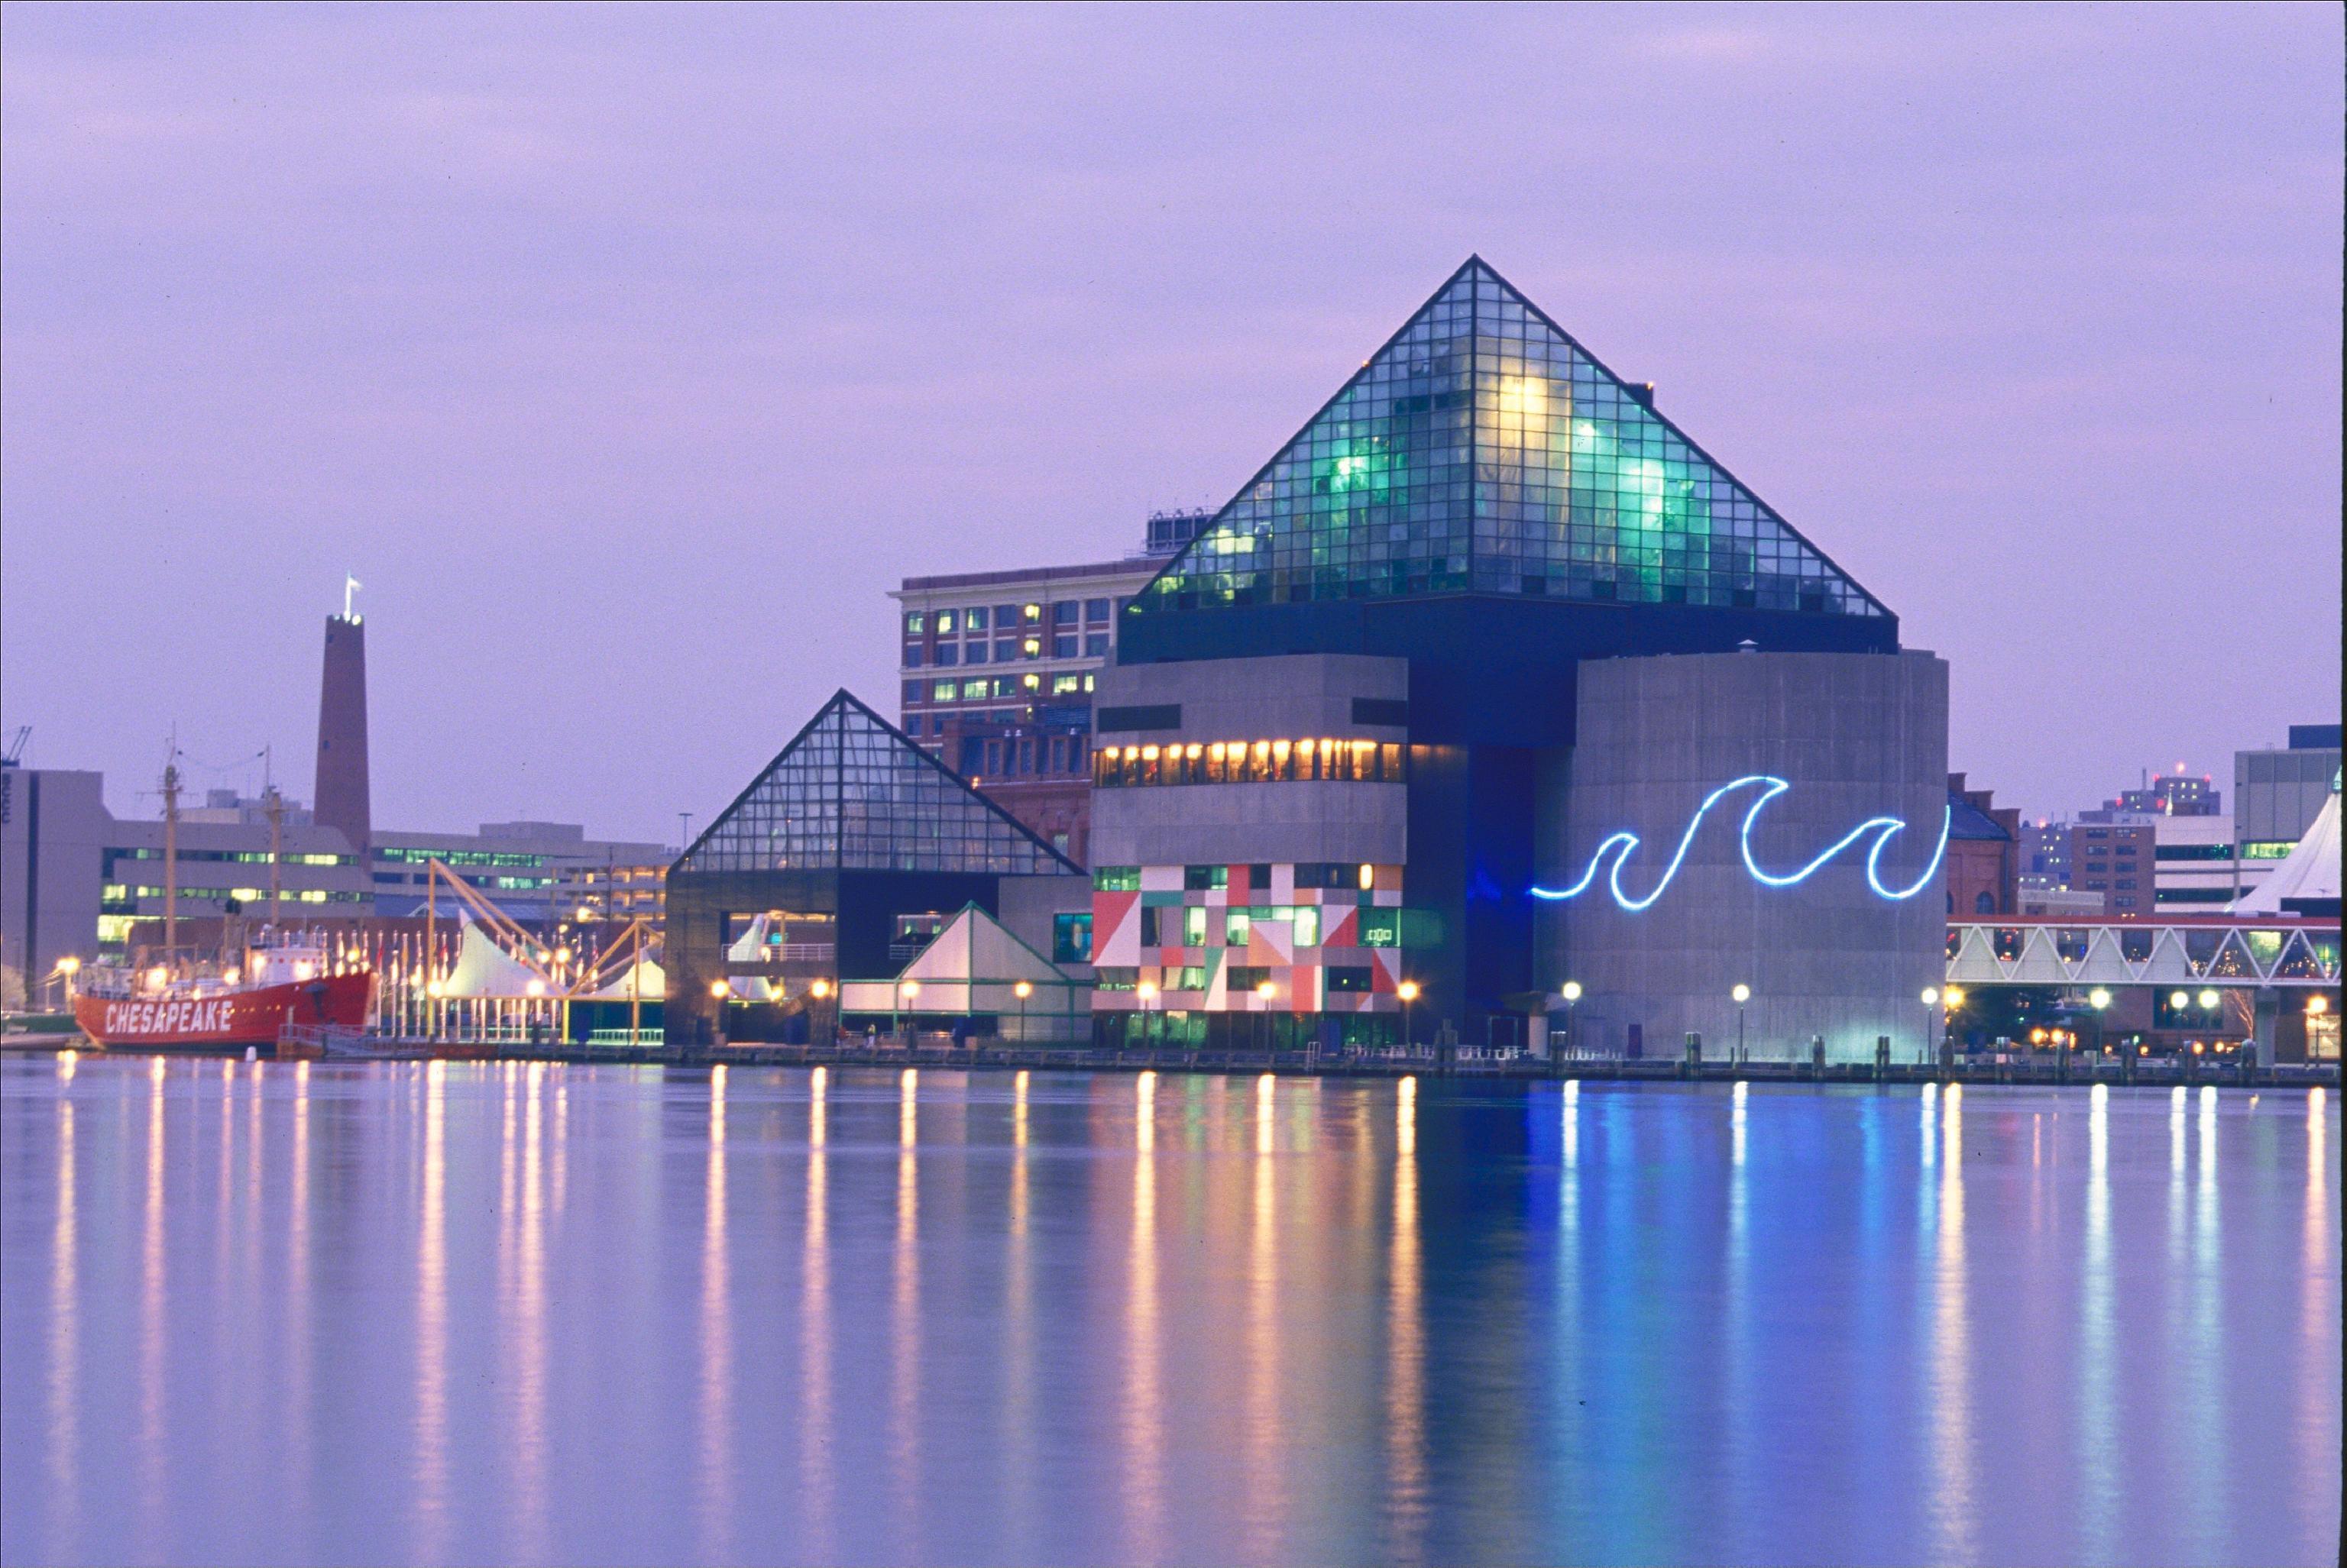 July 4th Pier Party @ Baltimore's National Aquarium ...